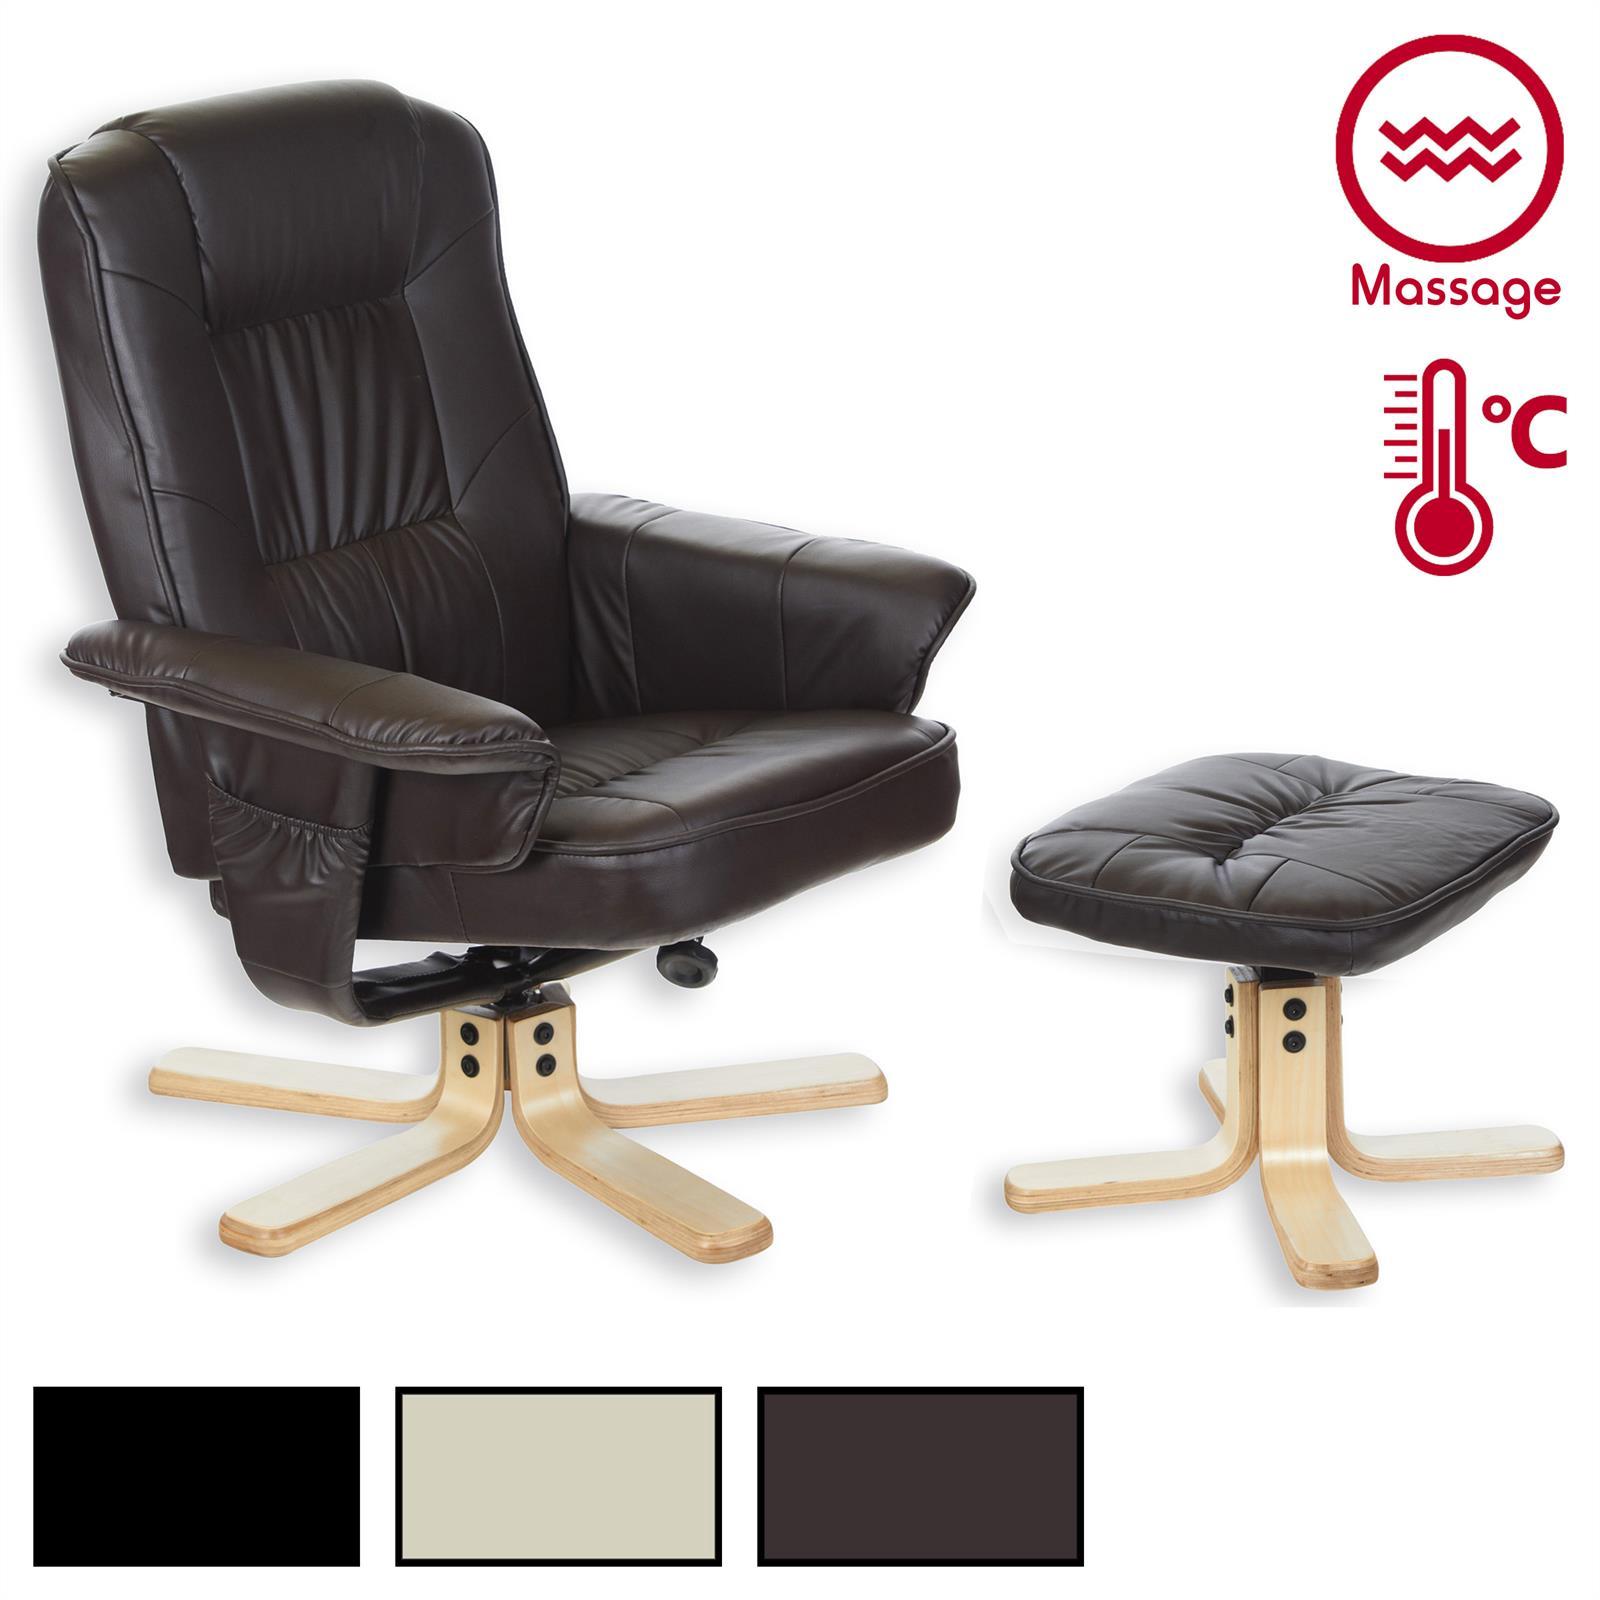 relaxsessel mit w rme und massagefunktion mobilia24. Black Bedroom Furniture Sets. Home Design Ideas